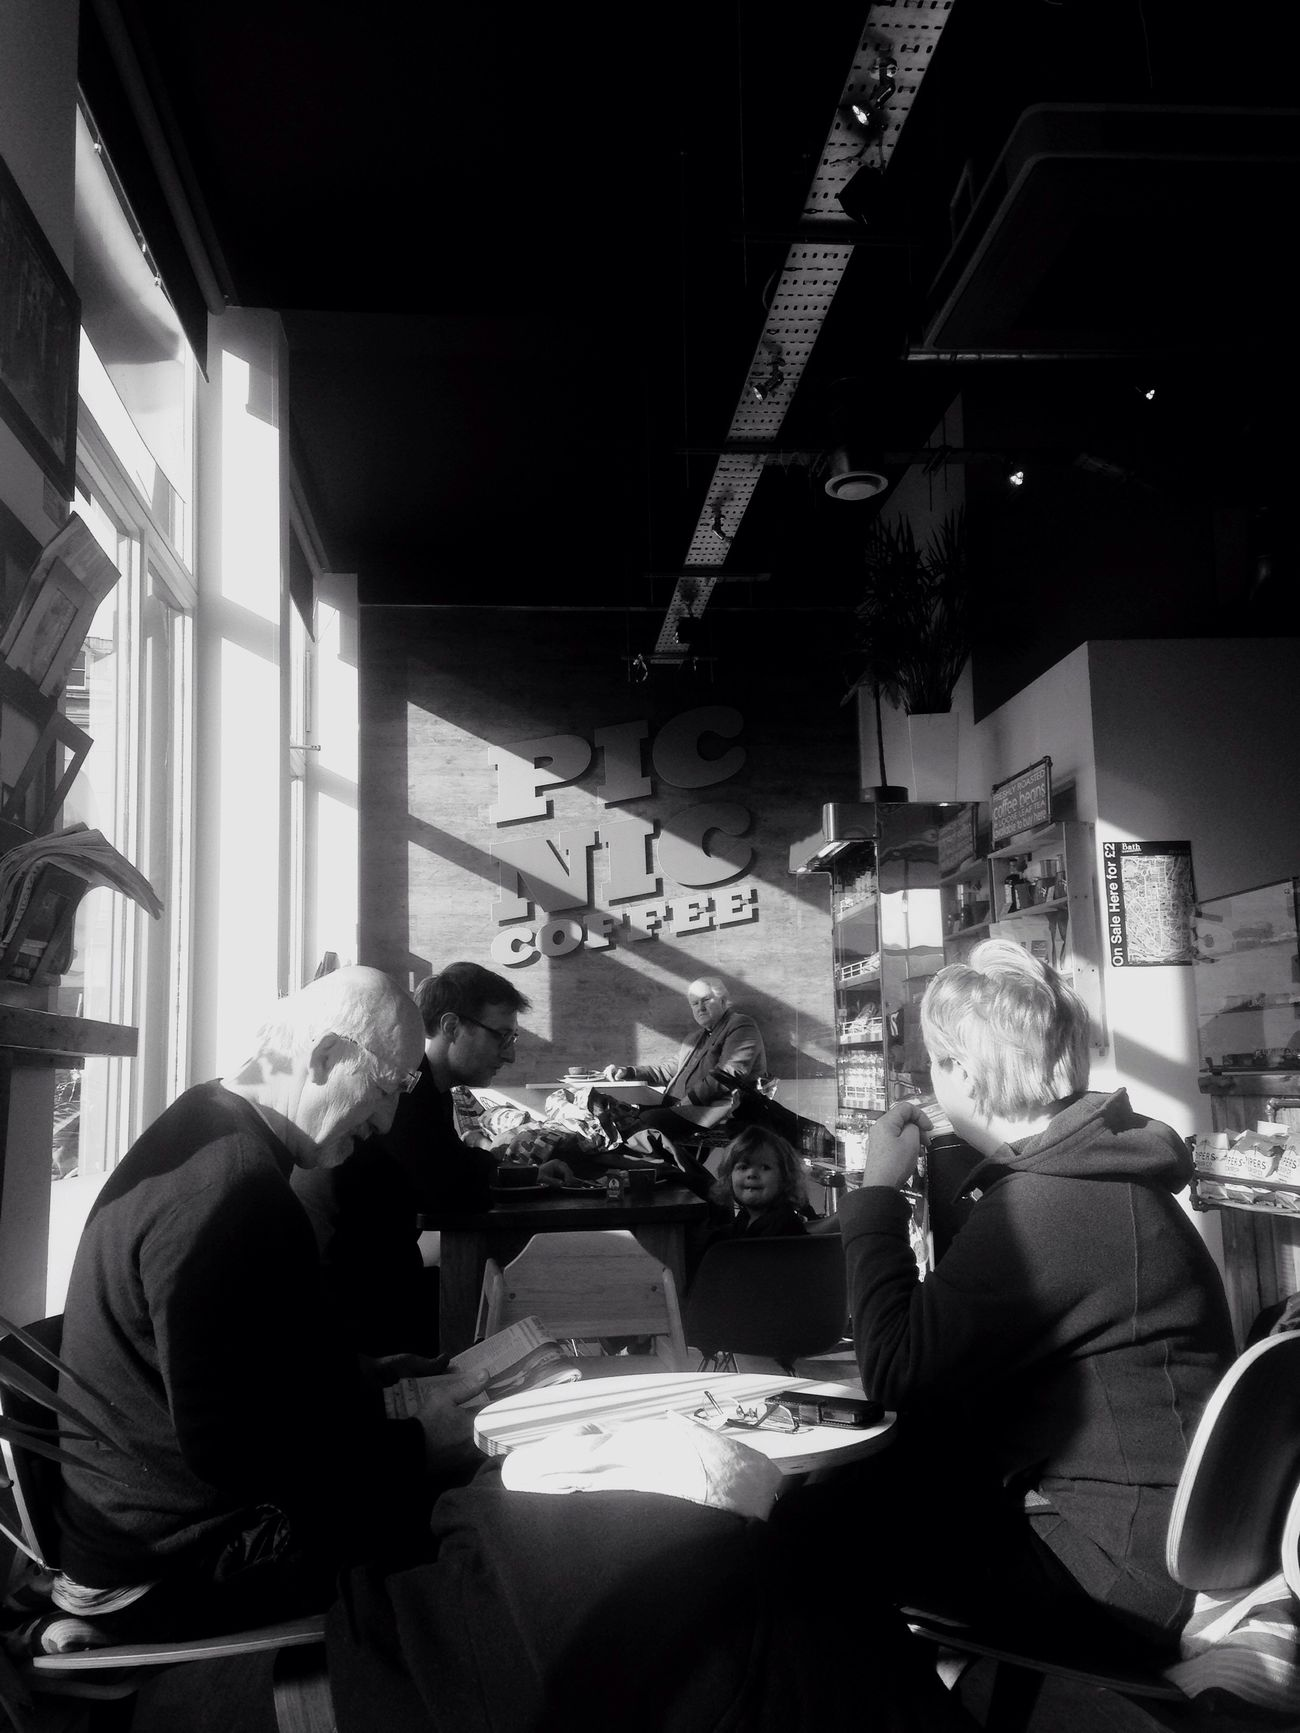 Coffee and chat IPhoneography Bathcity Evedoyle Wildcat Media Espresso Enjoying Life on a Sunday morning.....